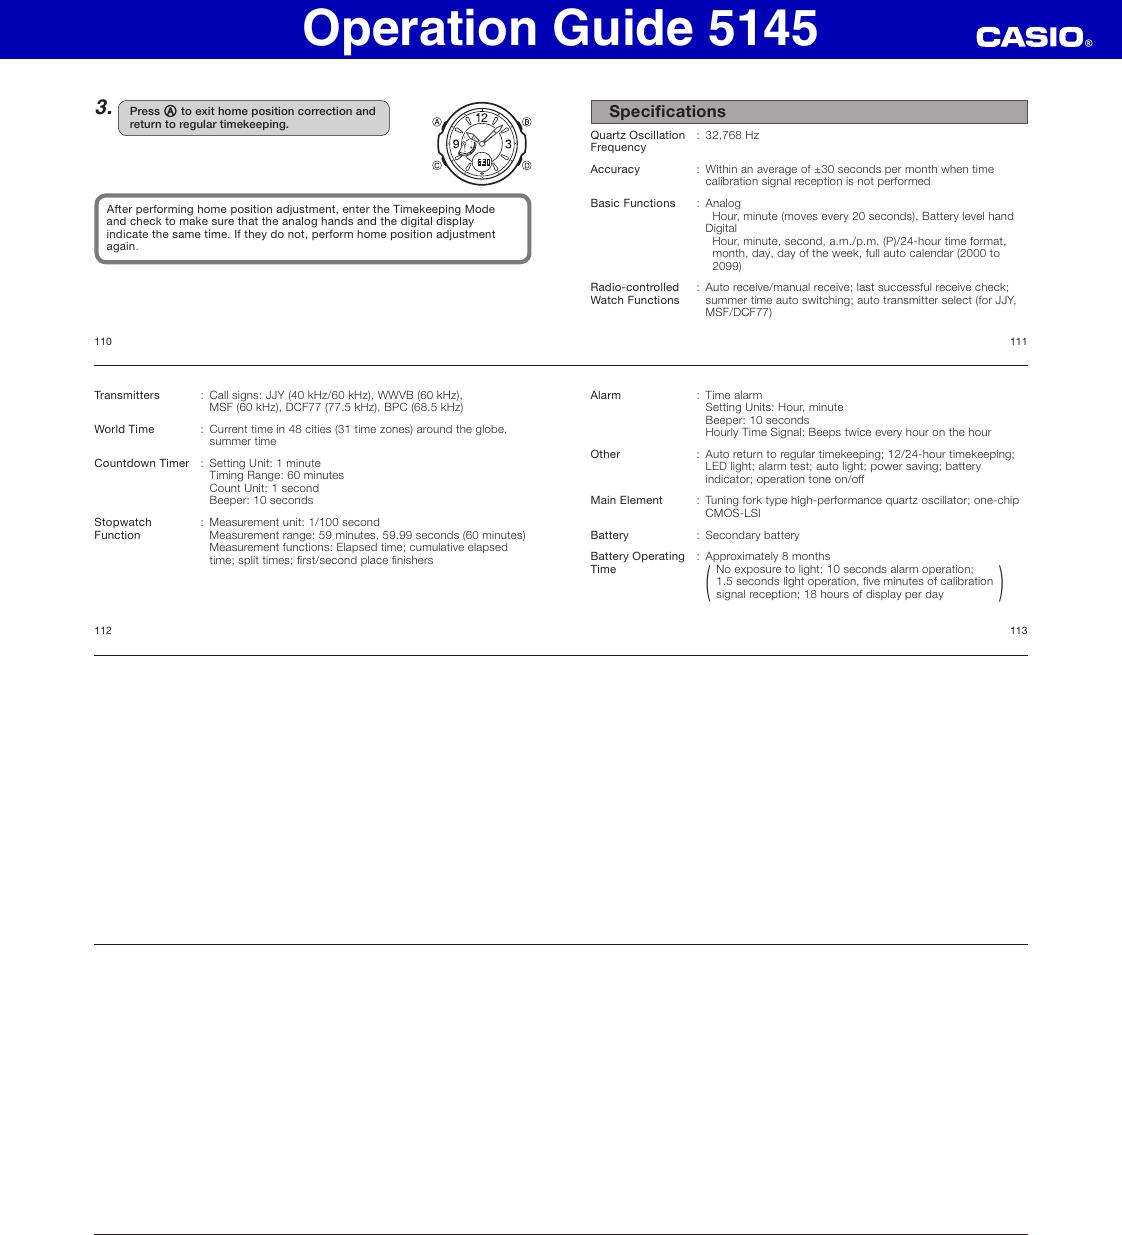 Honeywell 5145 QW User Manual To The Ac0990e2 b5fd 4565 a631 ...